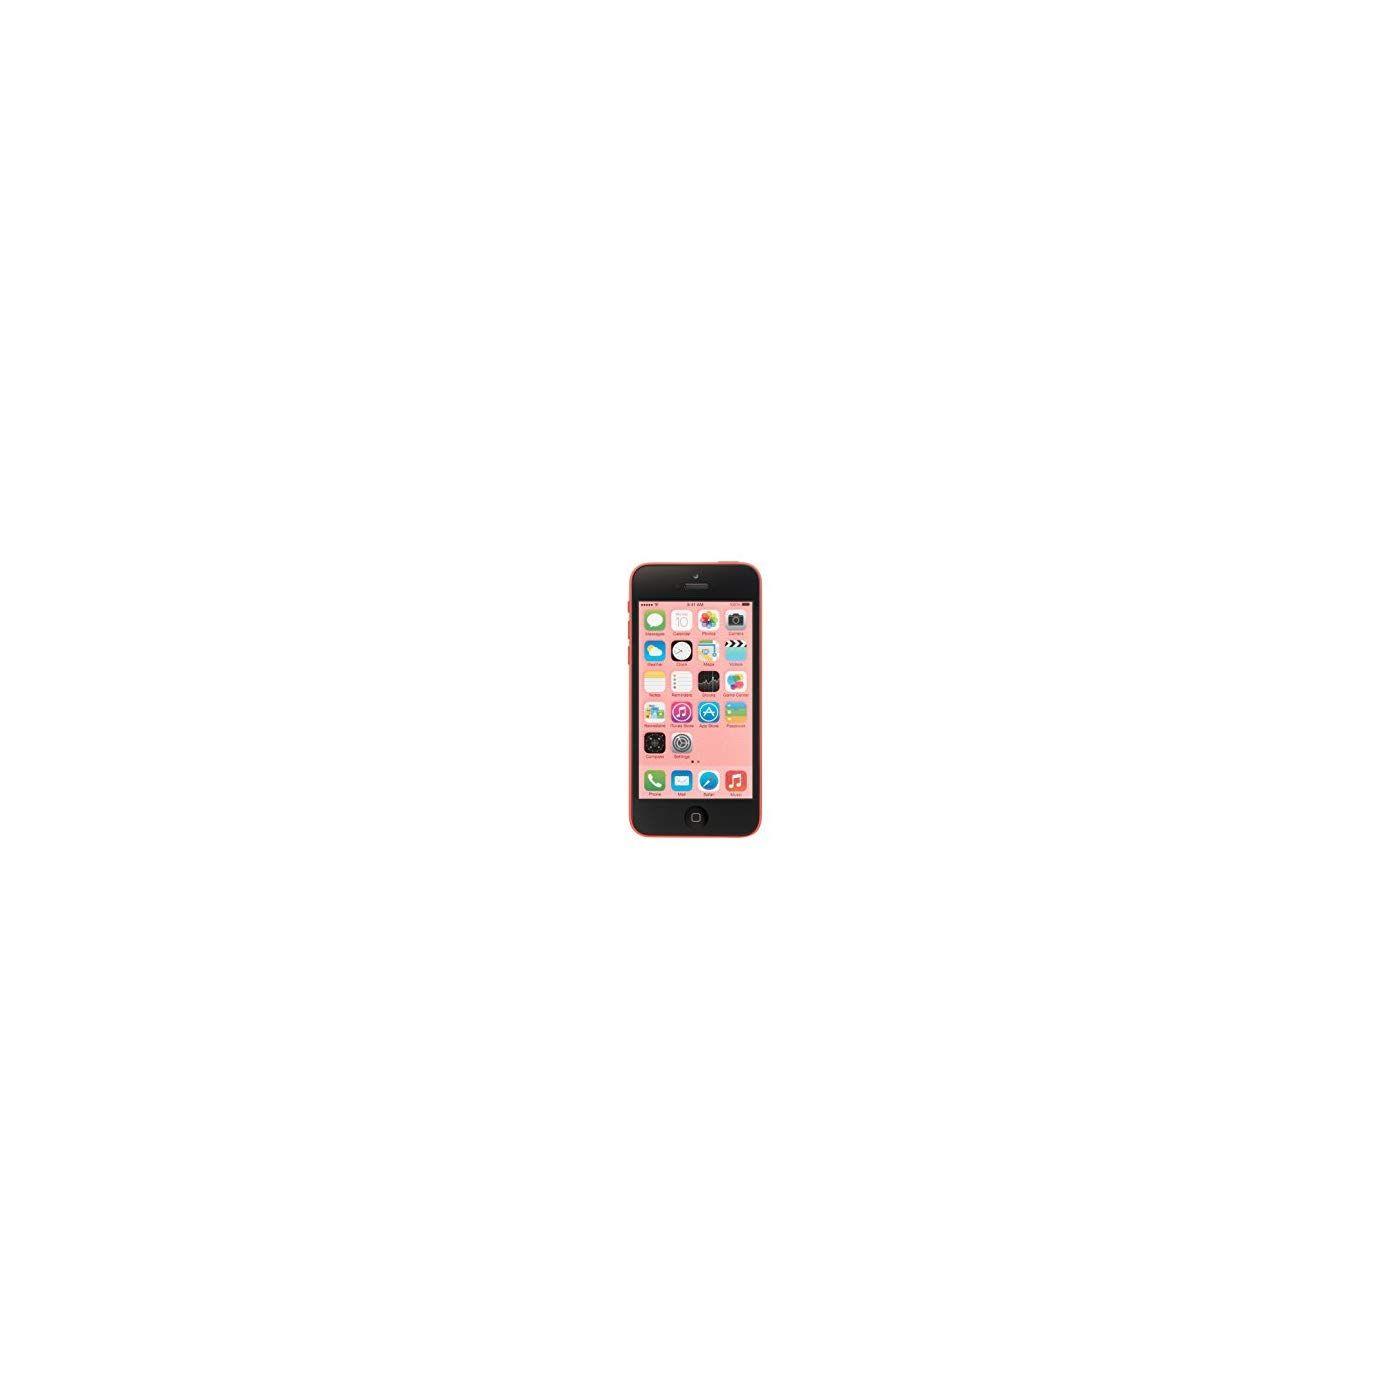 iphone 5c pink cex